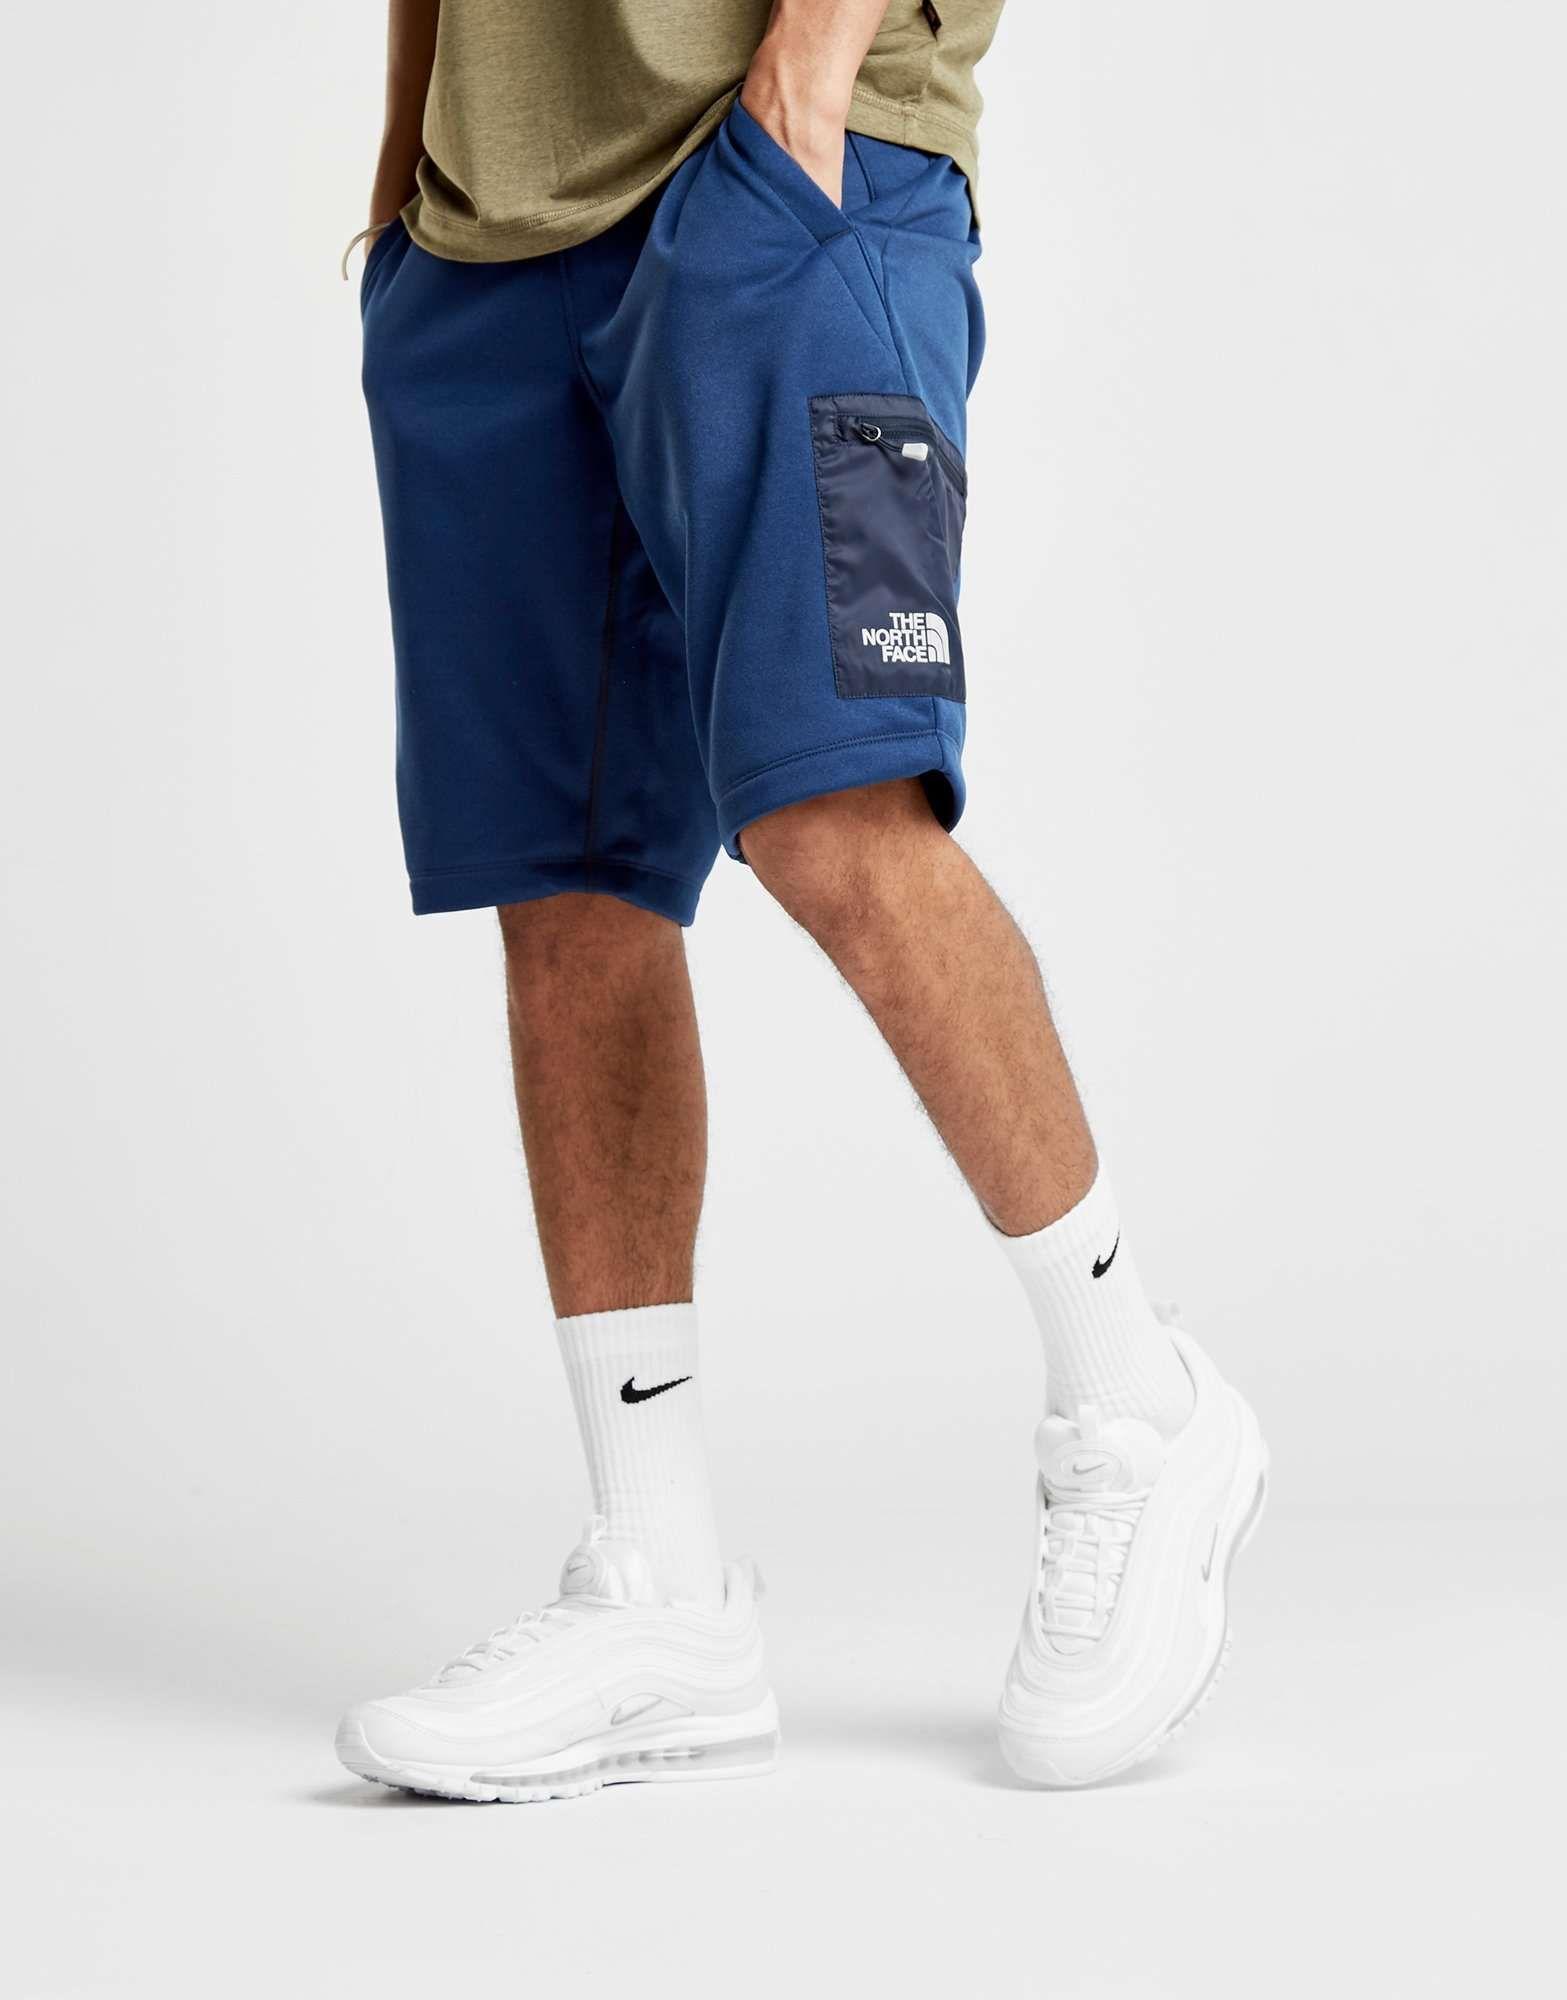 The North Face Mittellegi Shorts - Shop